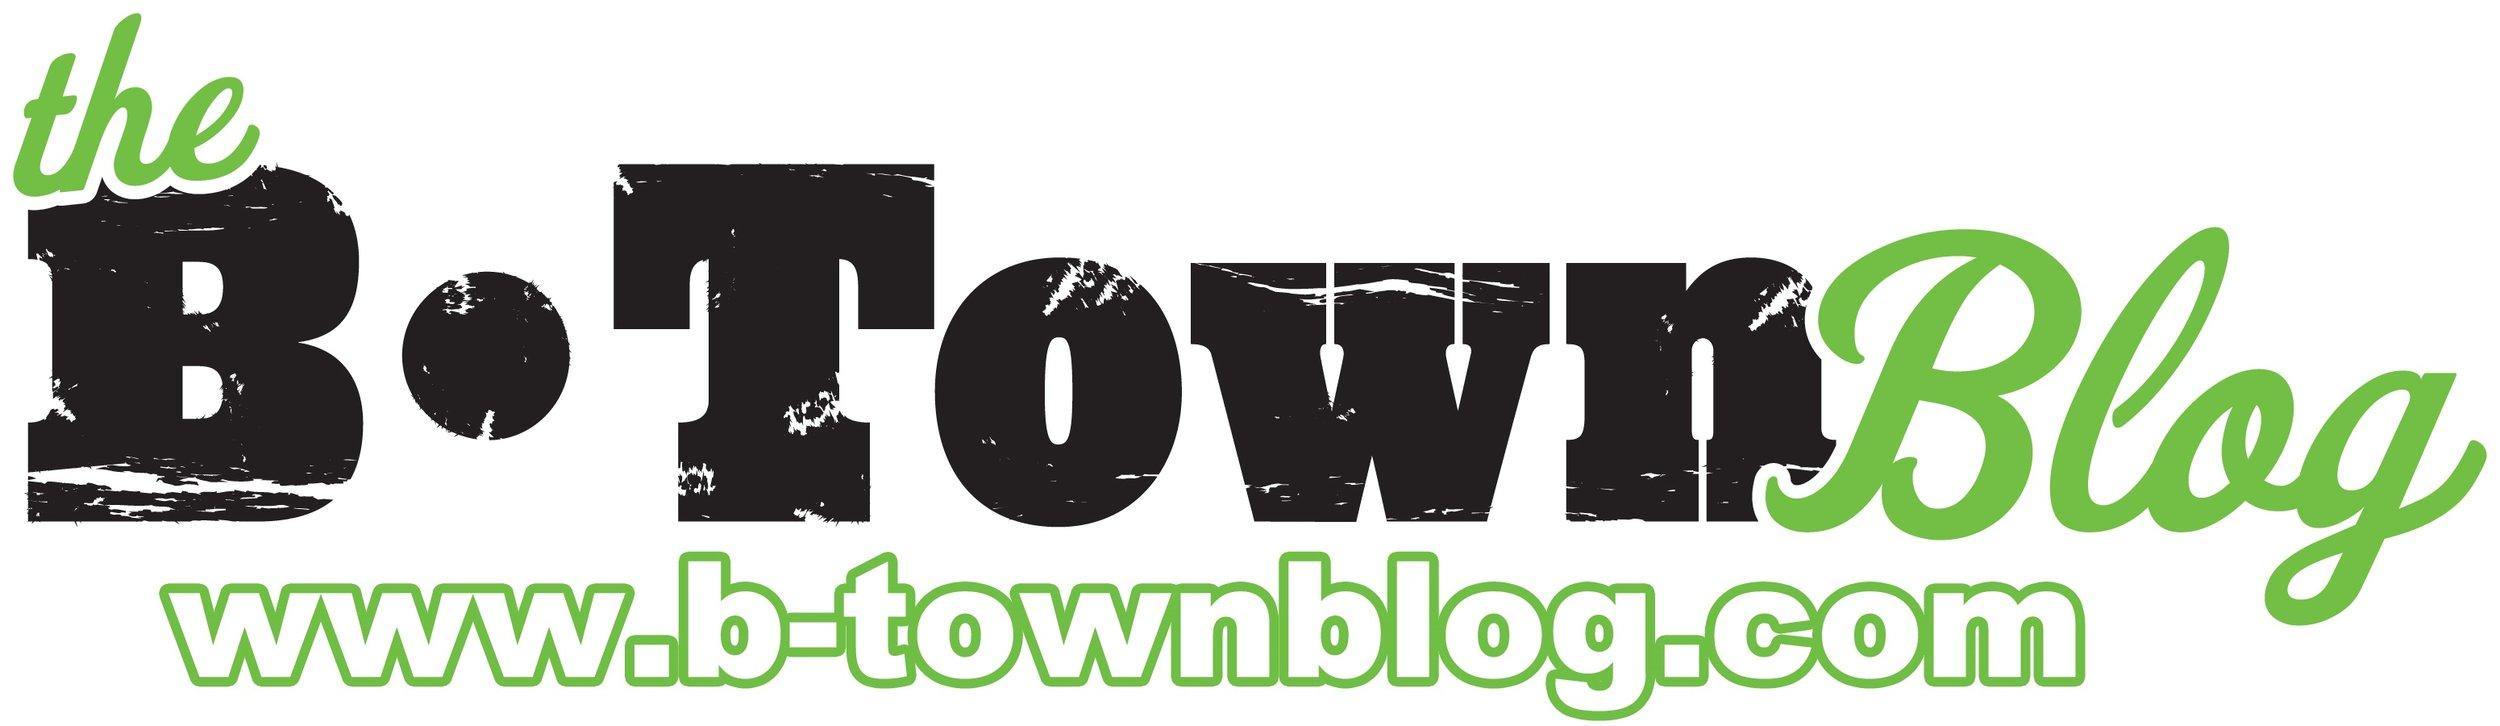 B town blog.jpg